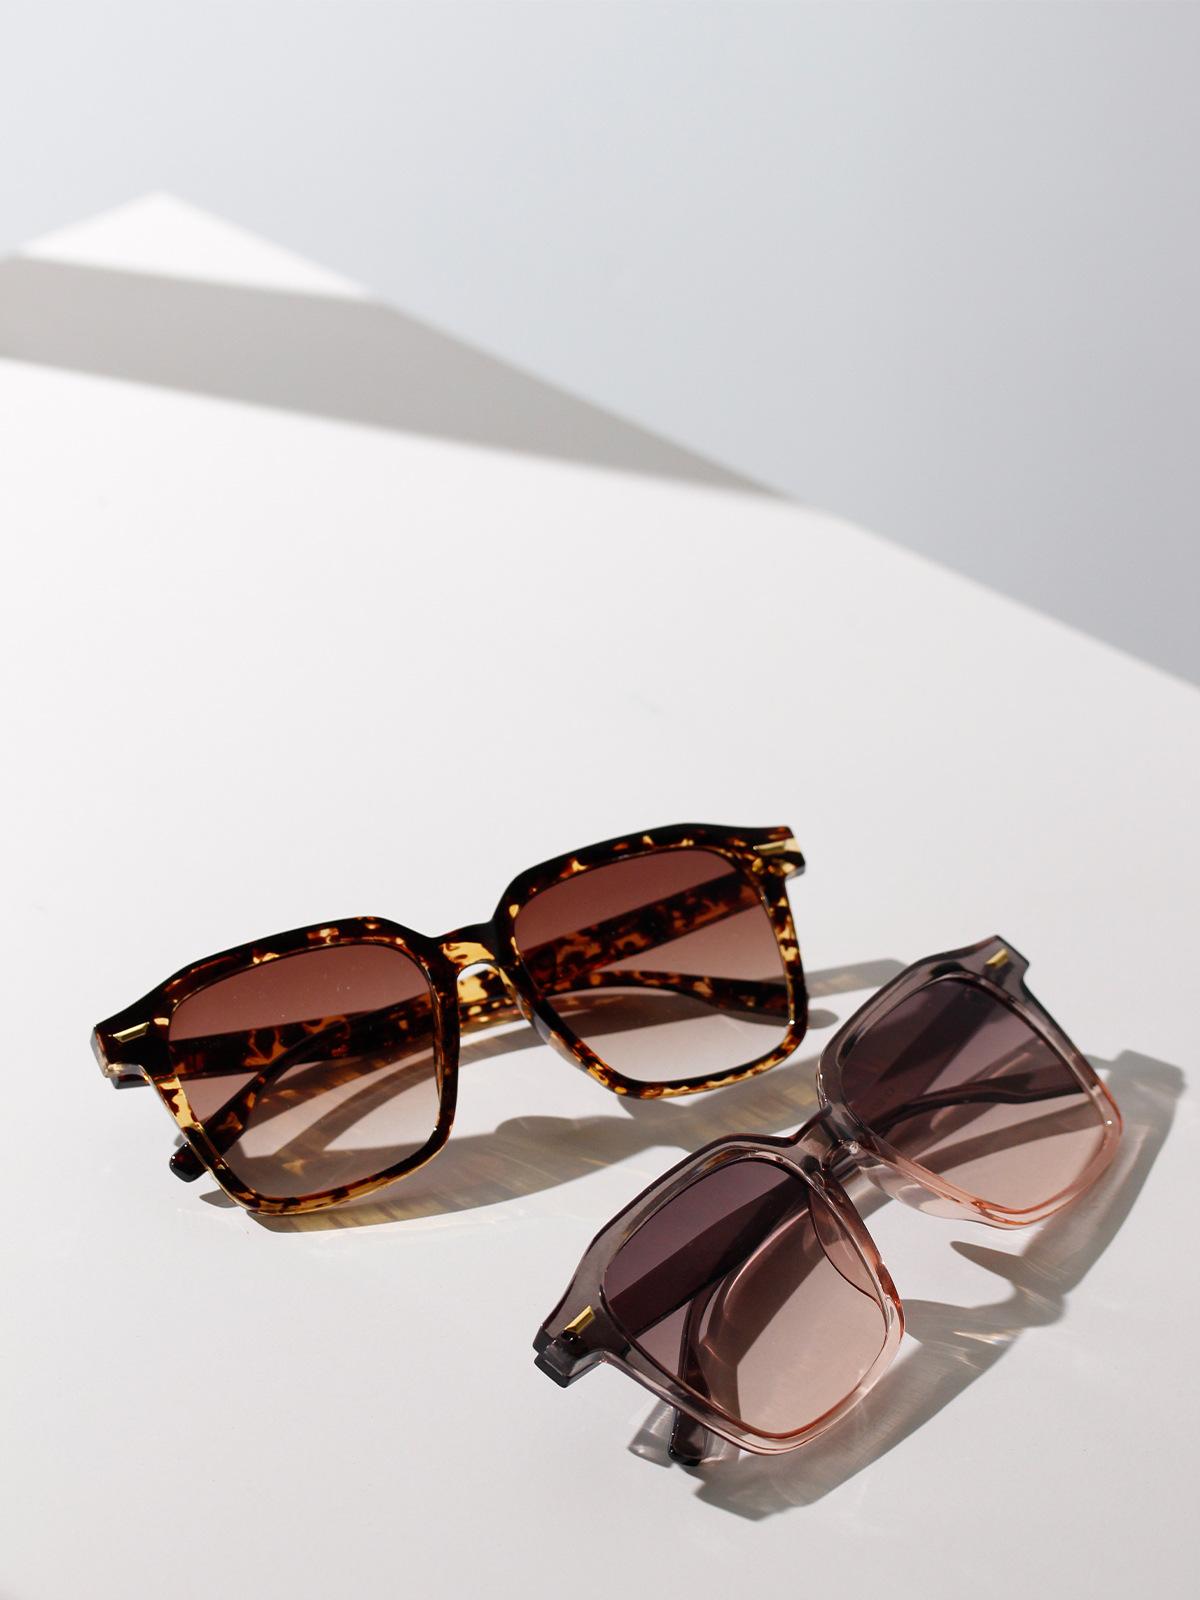 Fashion square rice nail retro sunglasses for women live small square sunglasses men antiUV glasses NHXU237673